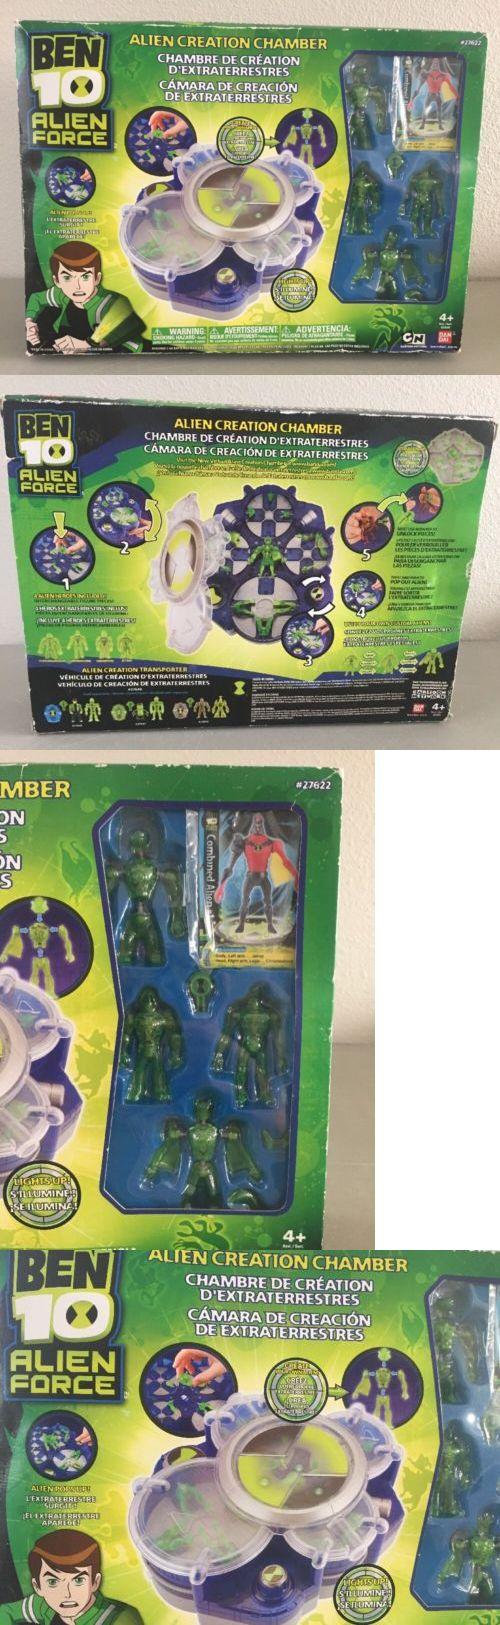 Ben 10 152906: Ben 10 Alien Force Alien Creation Chamber Blue #27622 Bandai 2009 Figures - New -> BUY IT NOW ONLY: $34.99 on eBay!